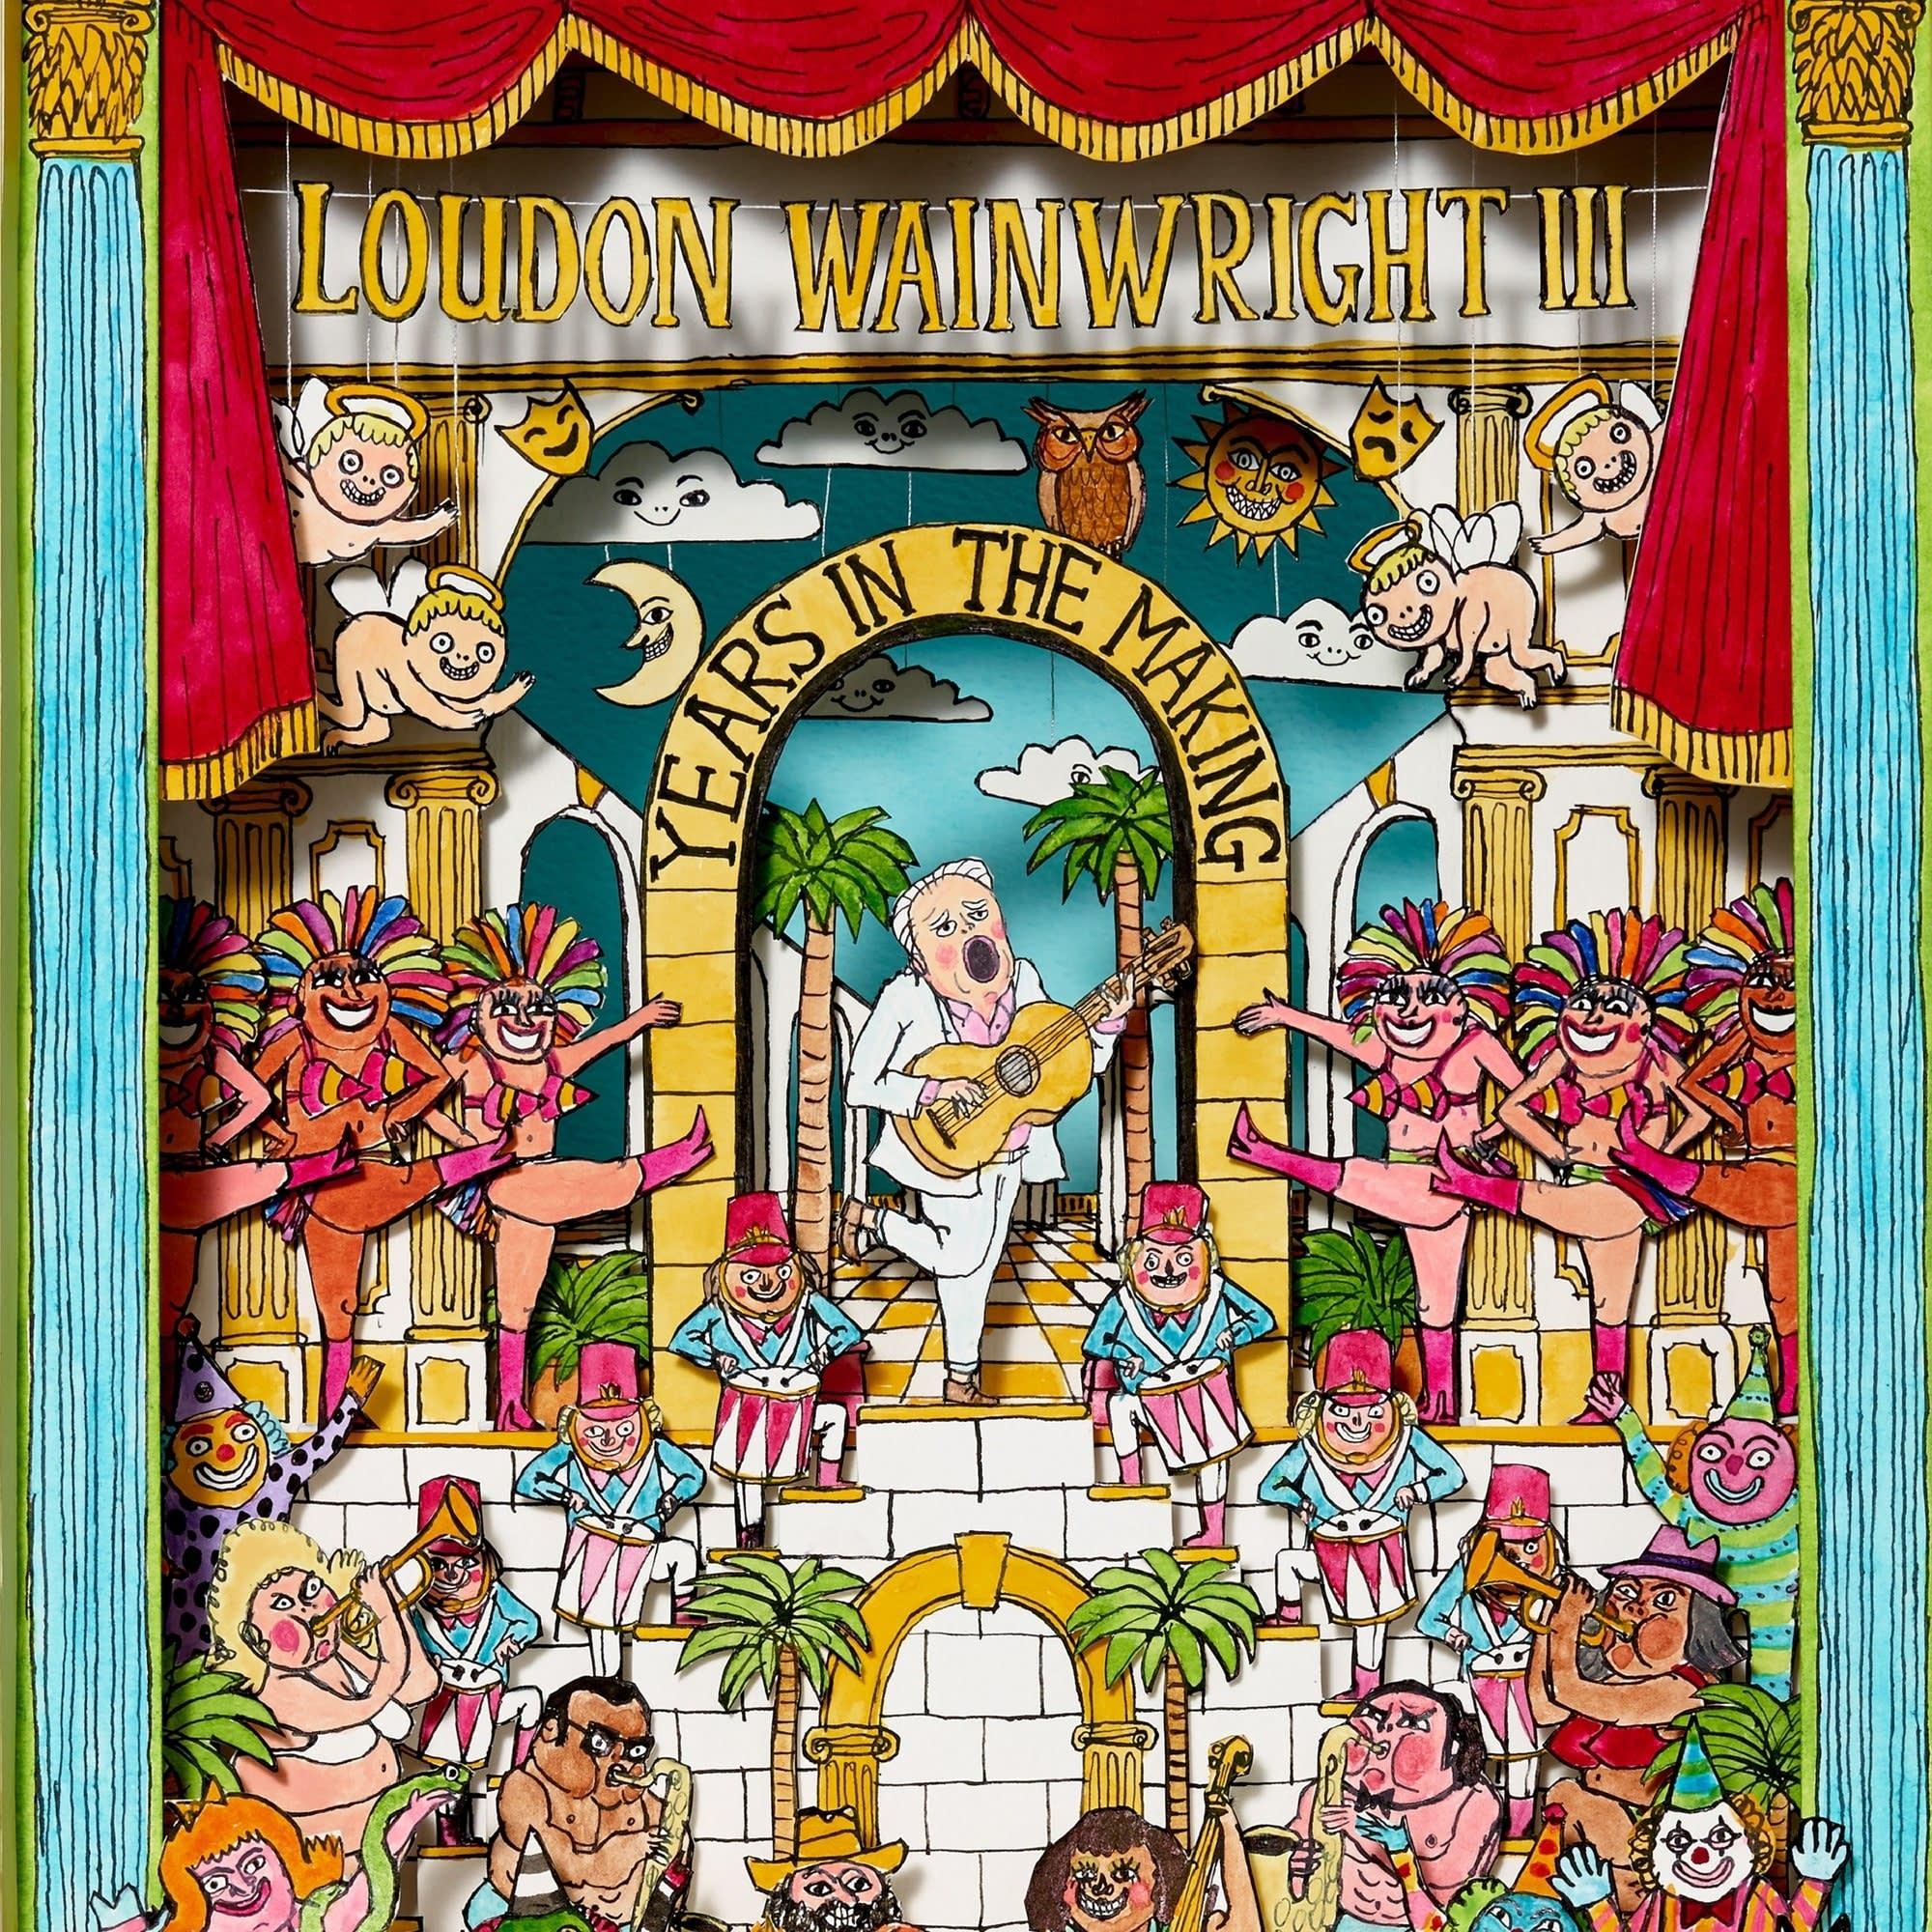 Loudon Wainwright III, 'Years in the Making'